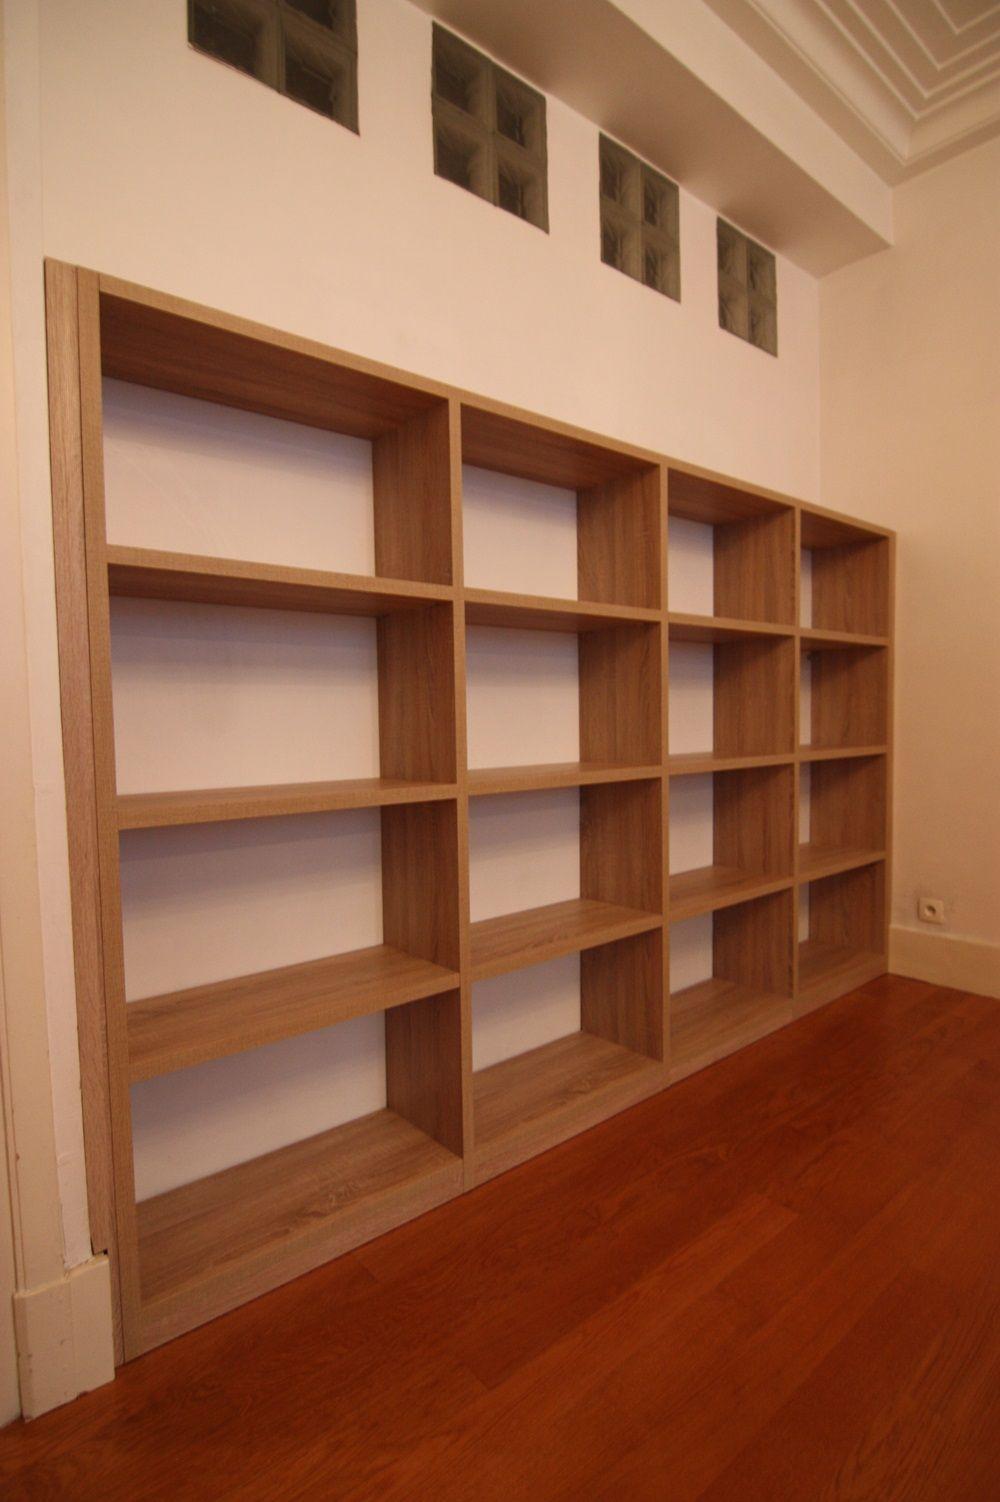 Bibliotheque sur mesure grenoble muebles en 2019 bibliotheque sur mesure rangement sur - Placard mural sur mesure ...